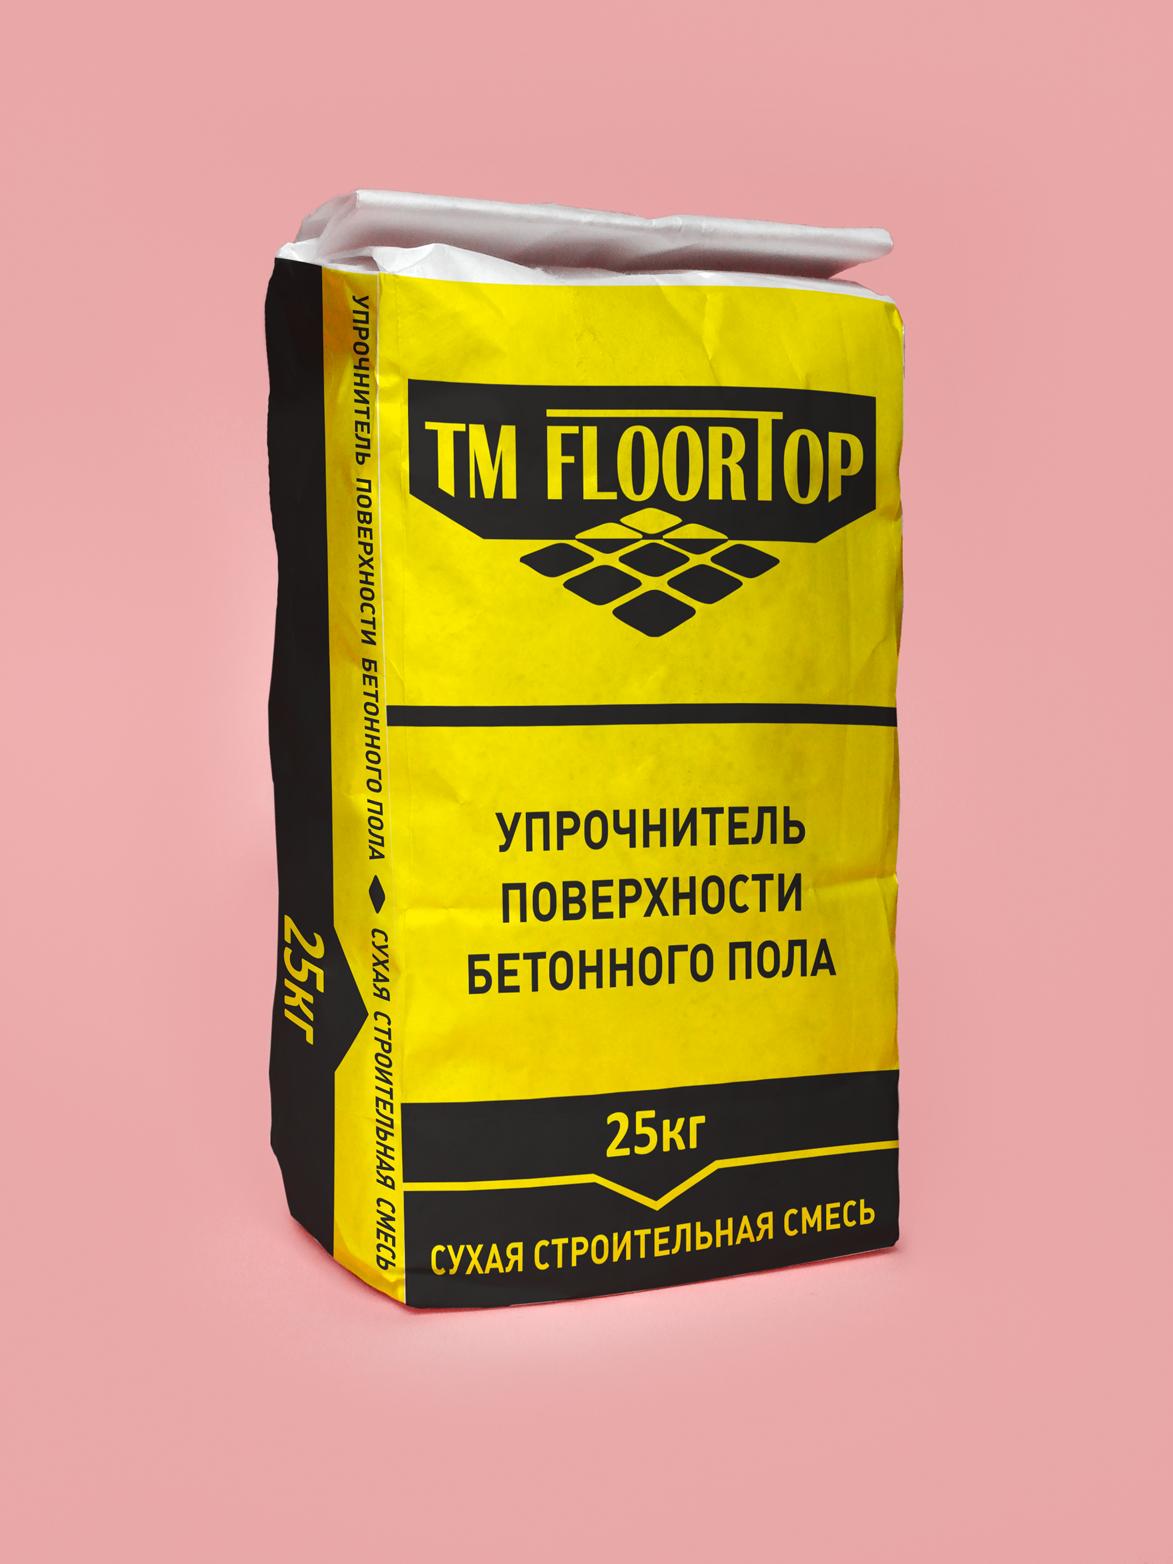 Разработка логотипа и дизайна на упаковку для сухой смеси фото f_5575d2c8b15b9cb8.png